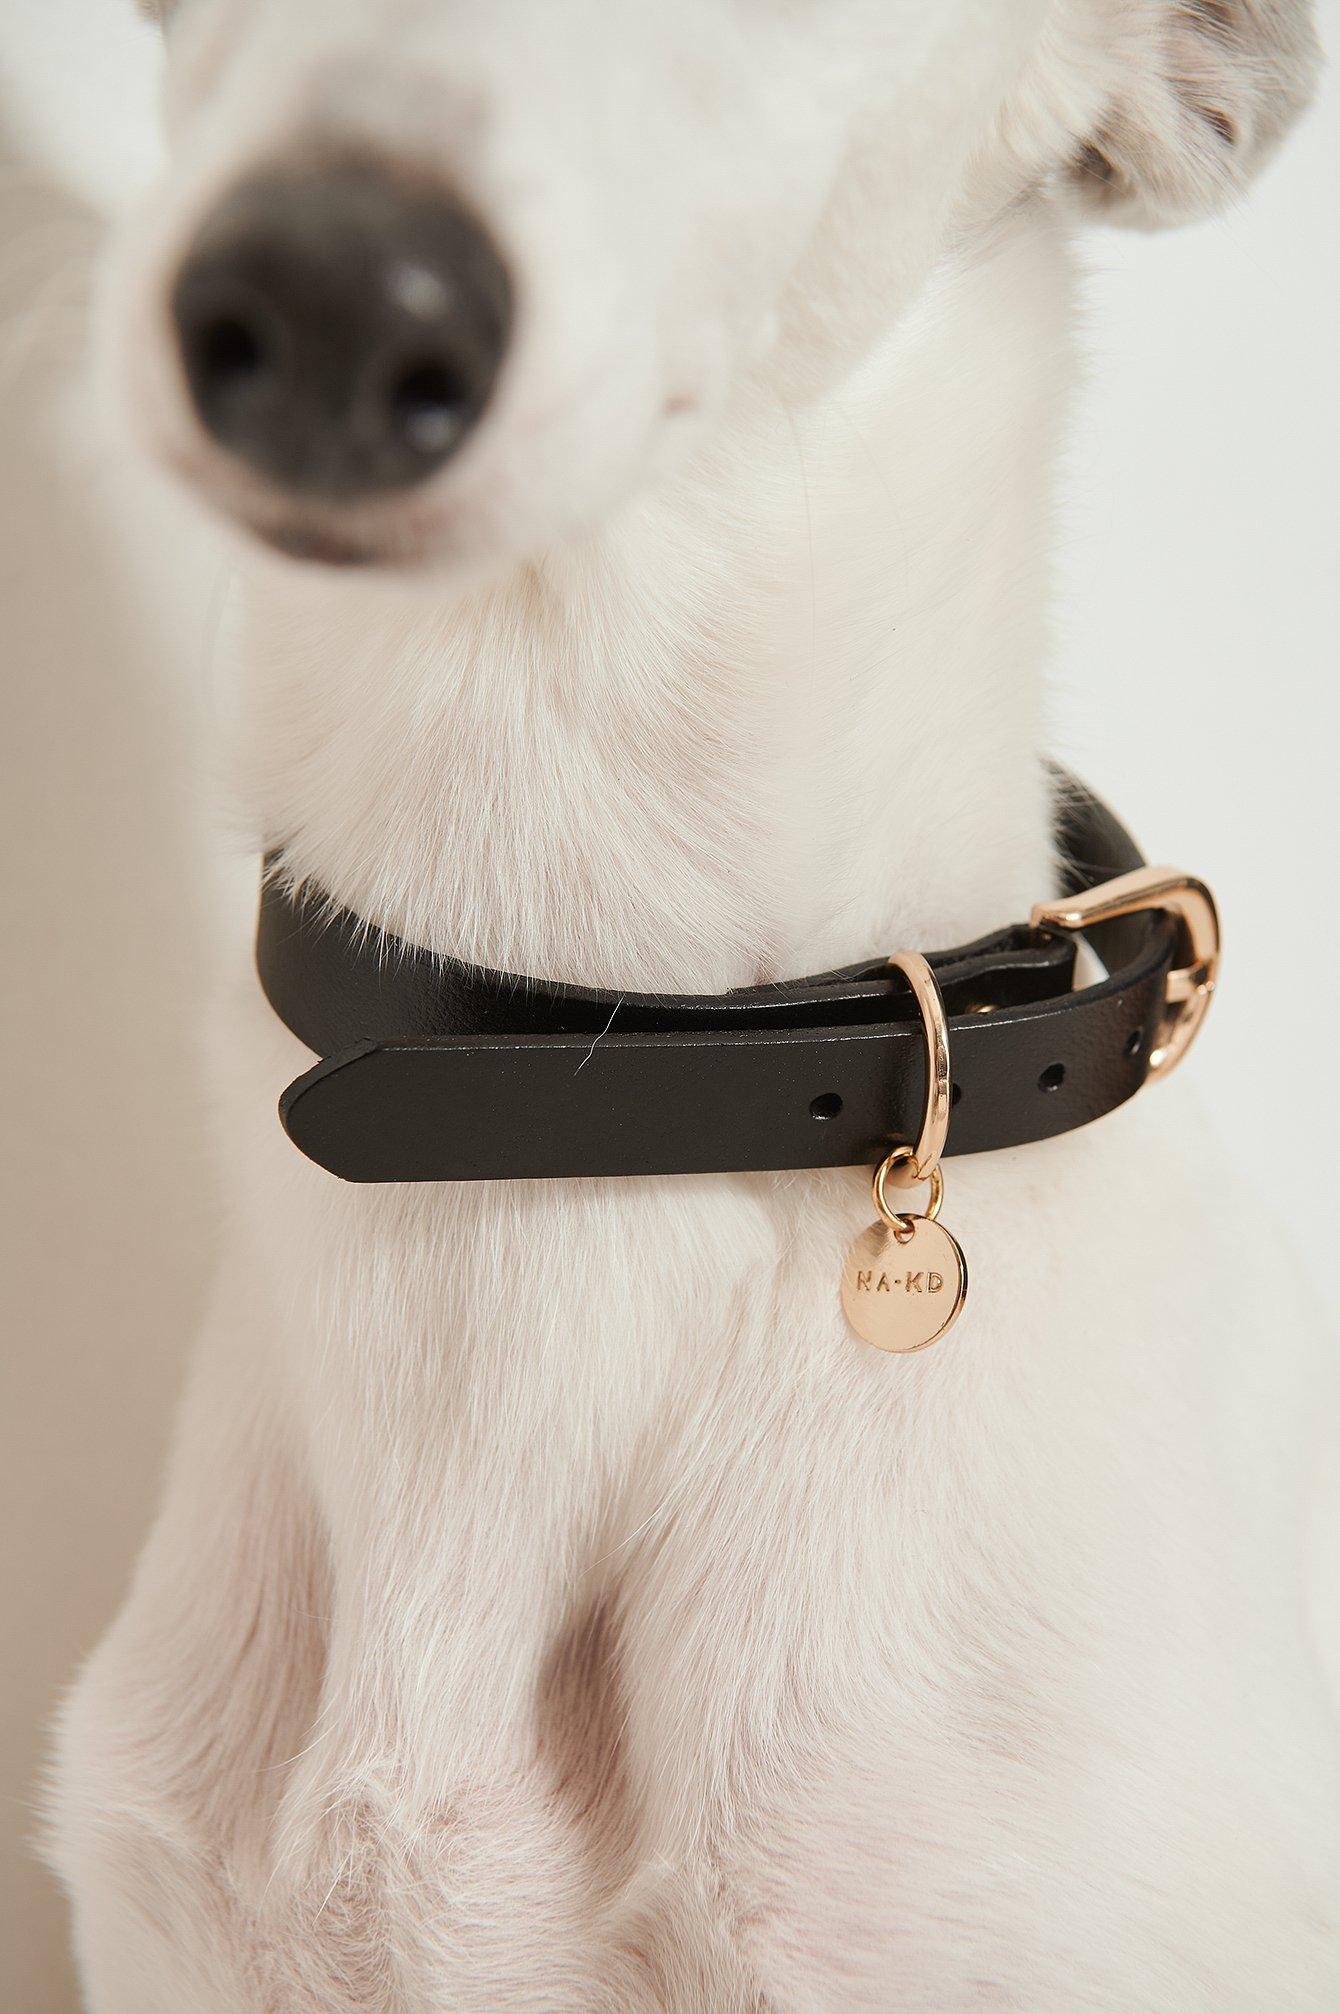 NA-KD Accessories Basic Leather Dog Collar - Black